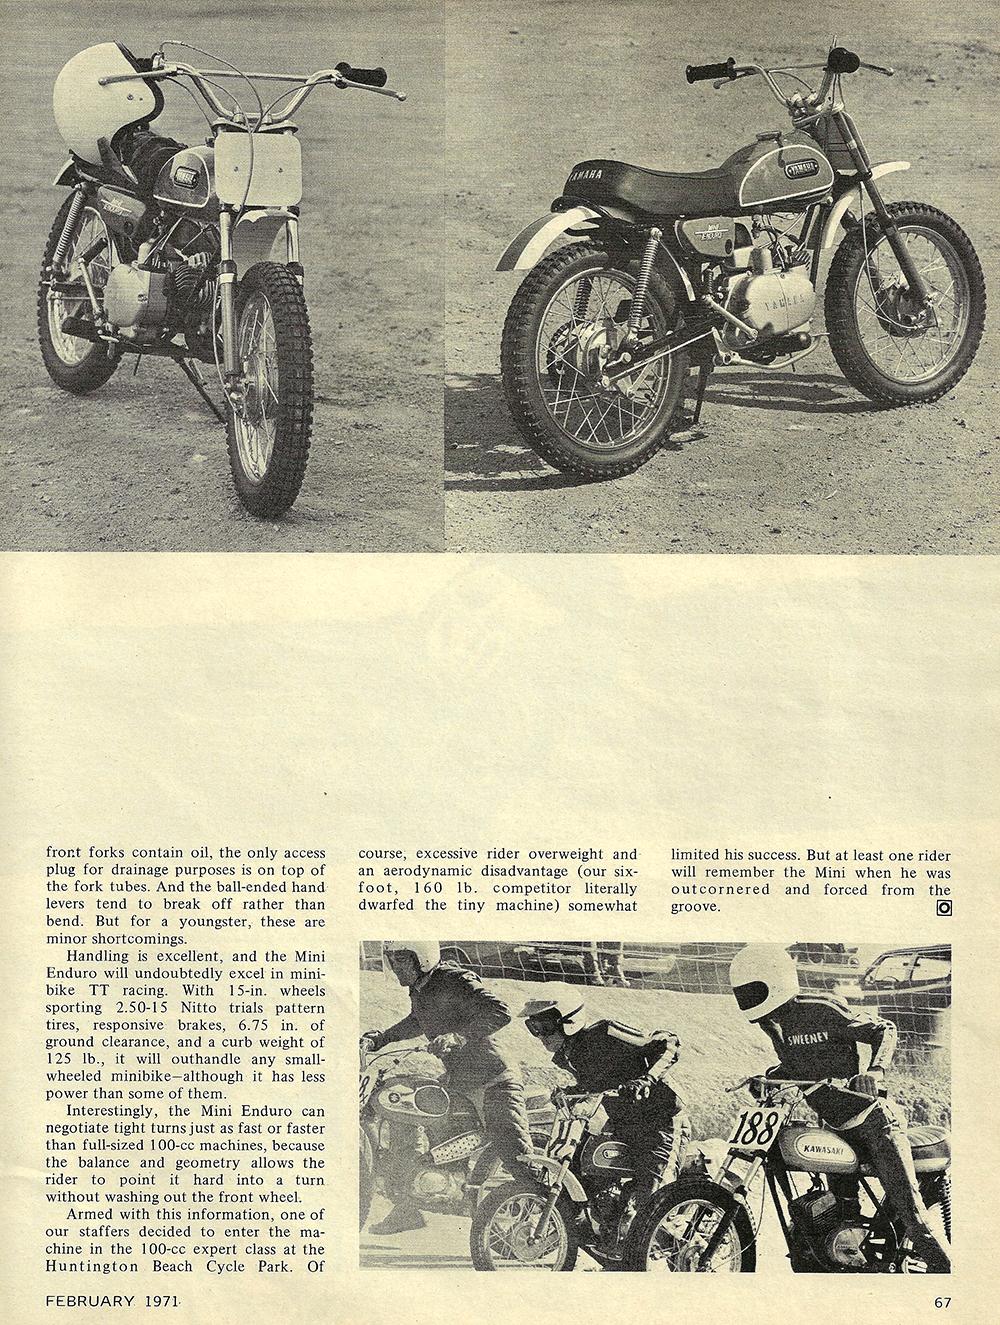 1971 Yamaha Mini Enduro test 02.jpg